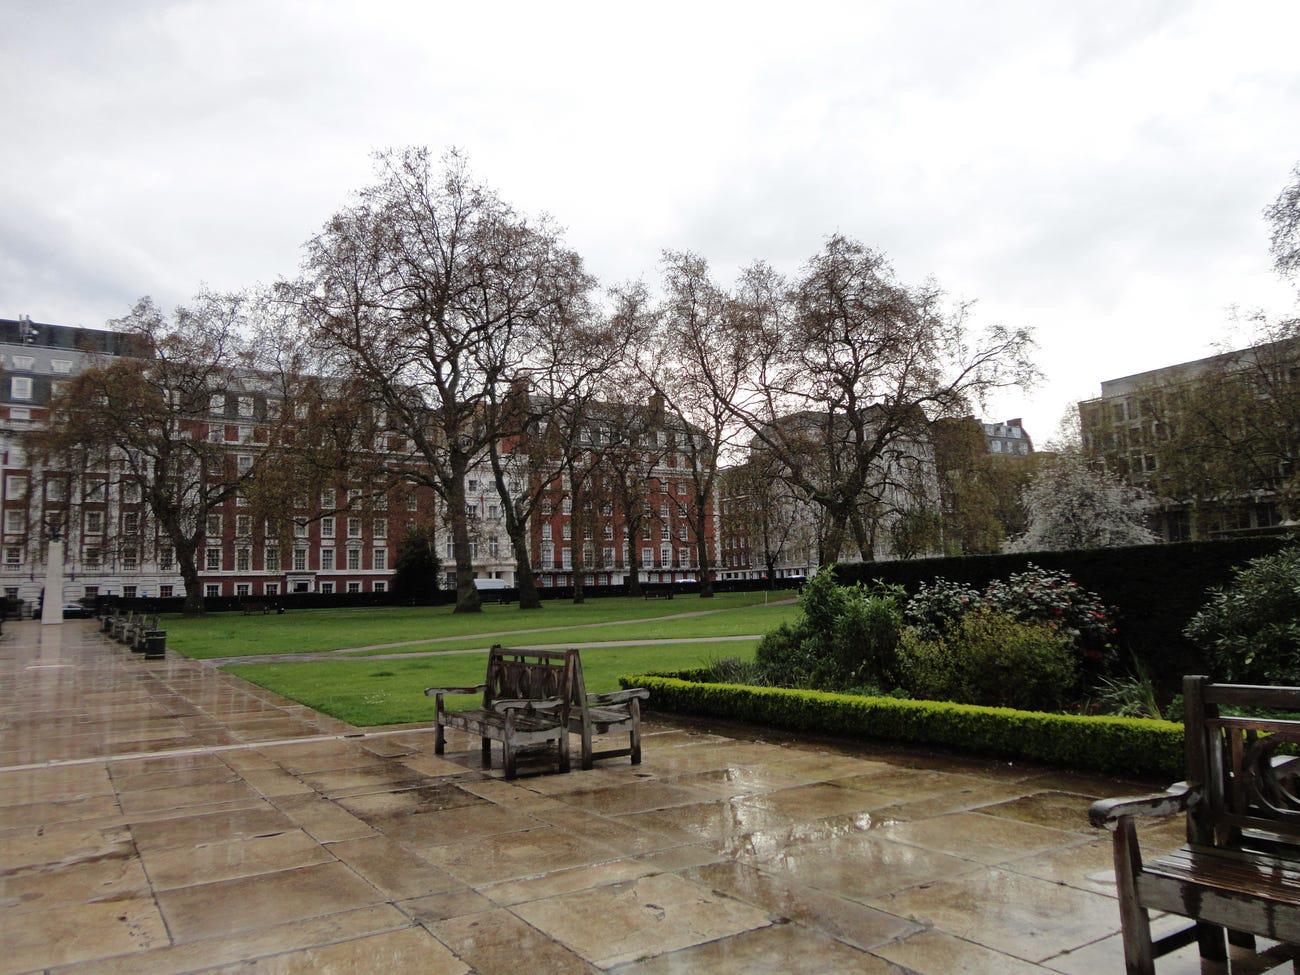 Quảng trường Grosvenor, London